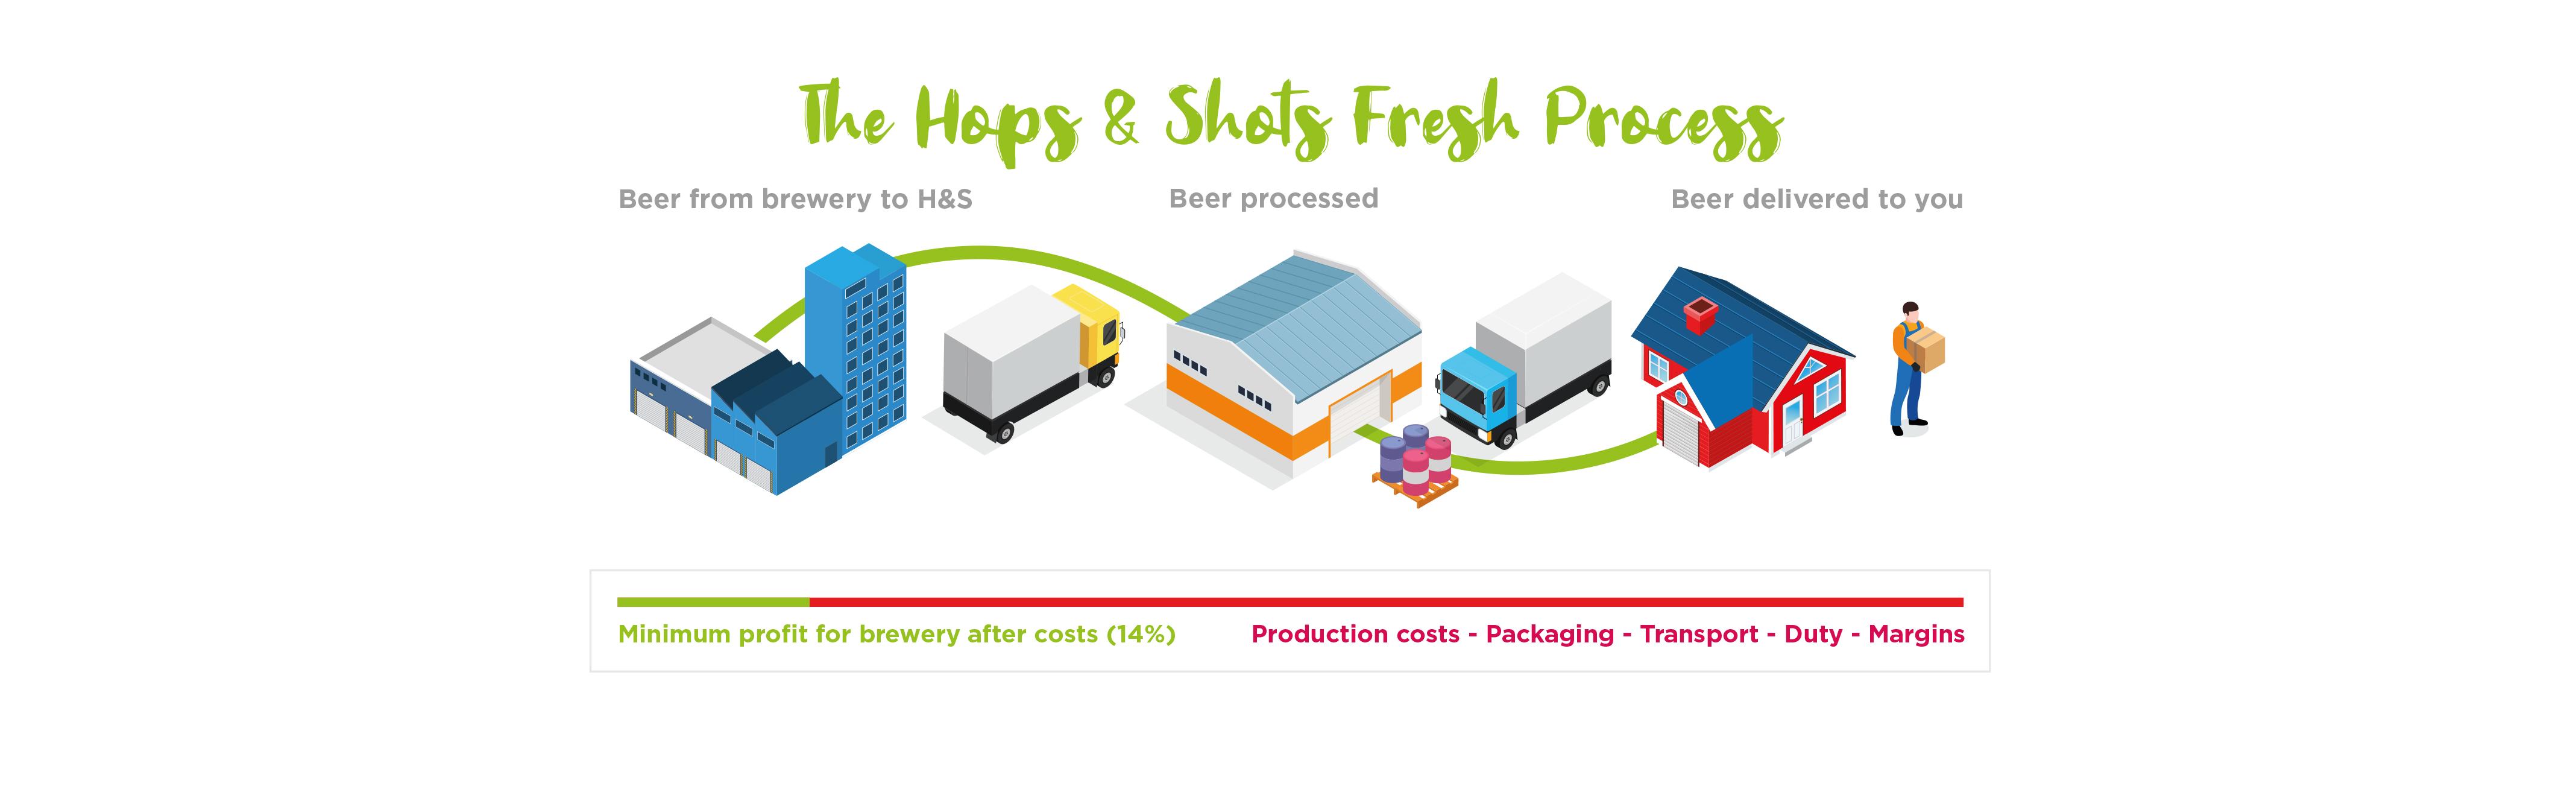 h-s-process1d.jpg